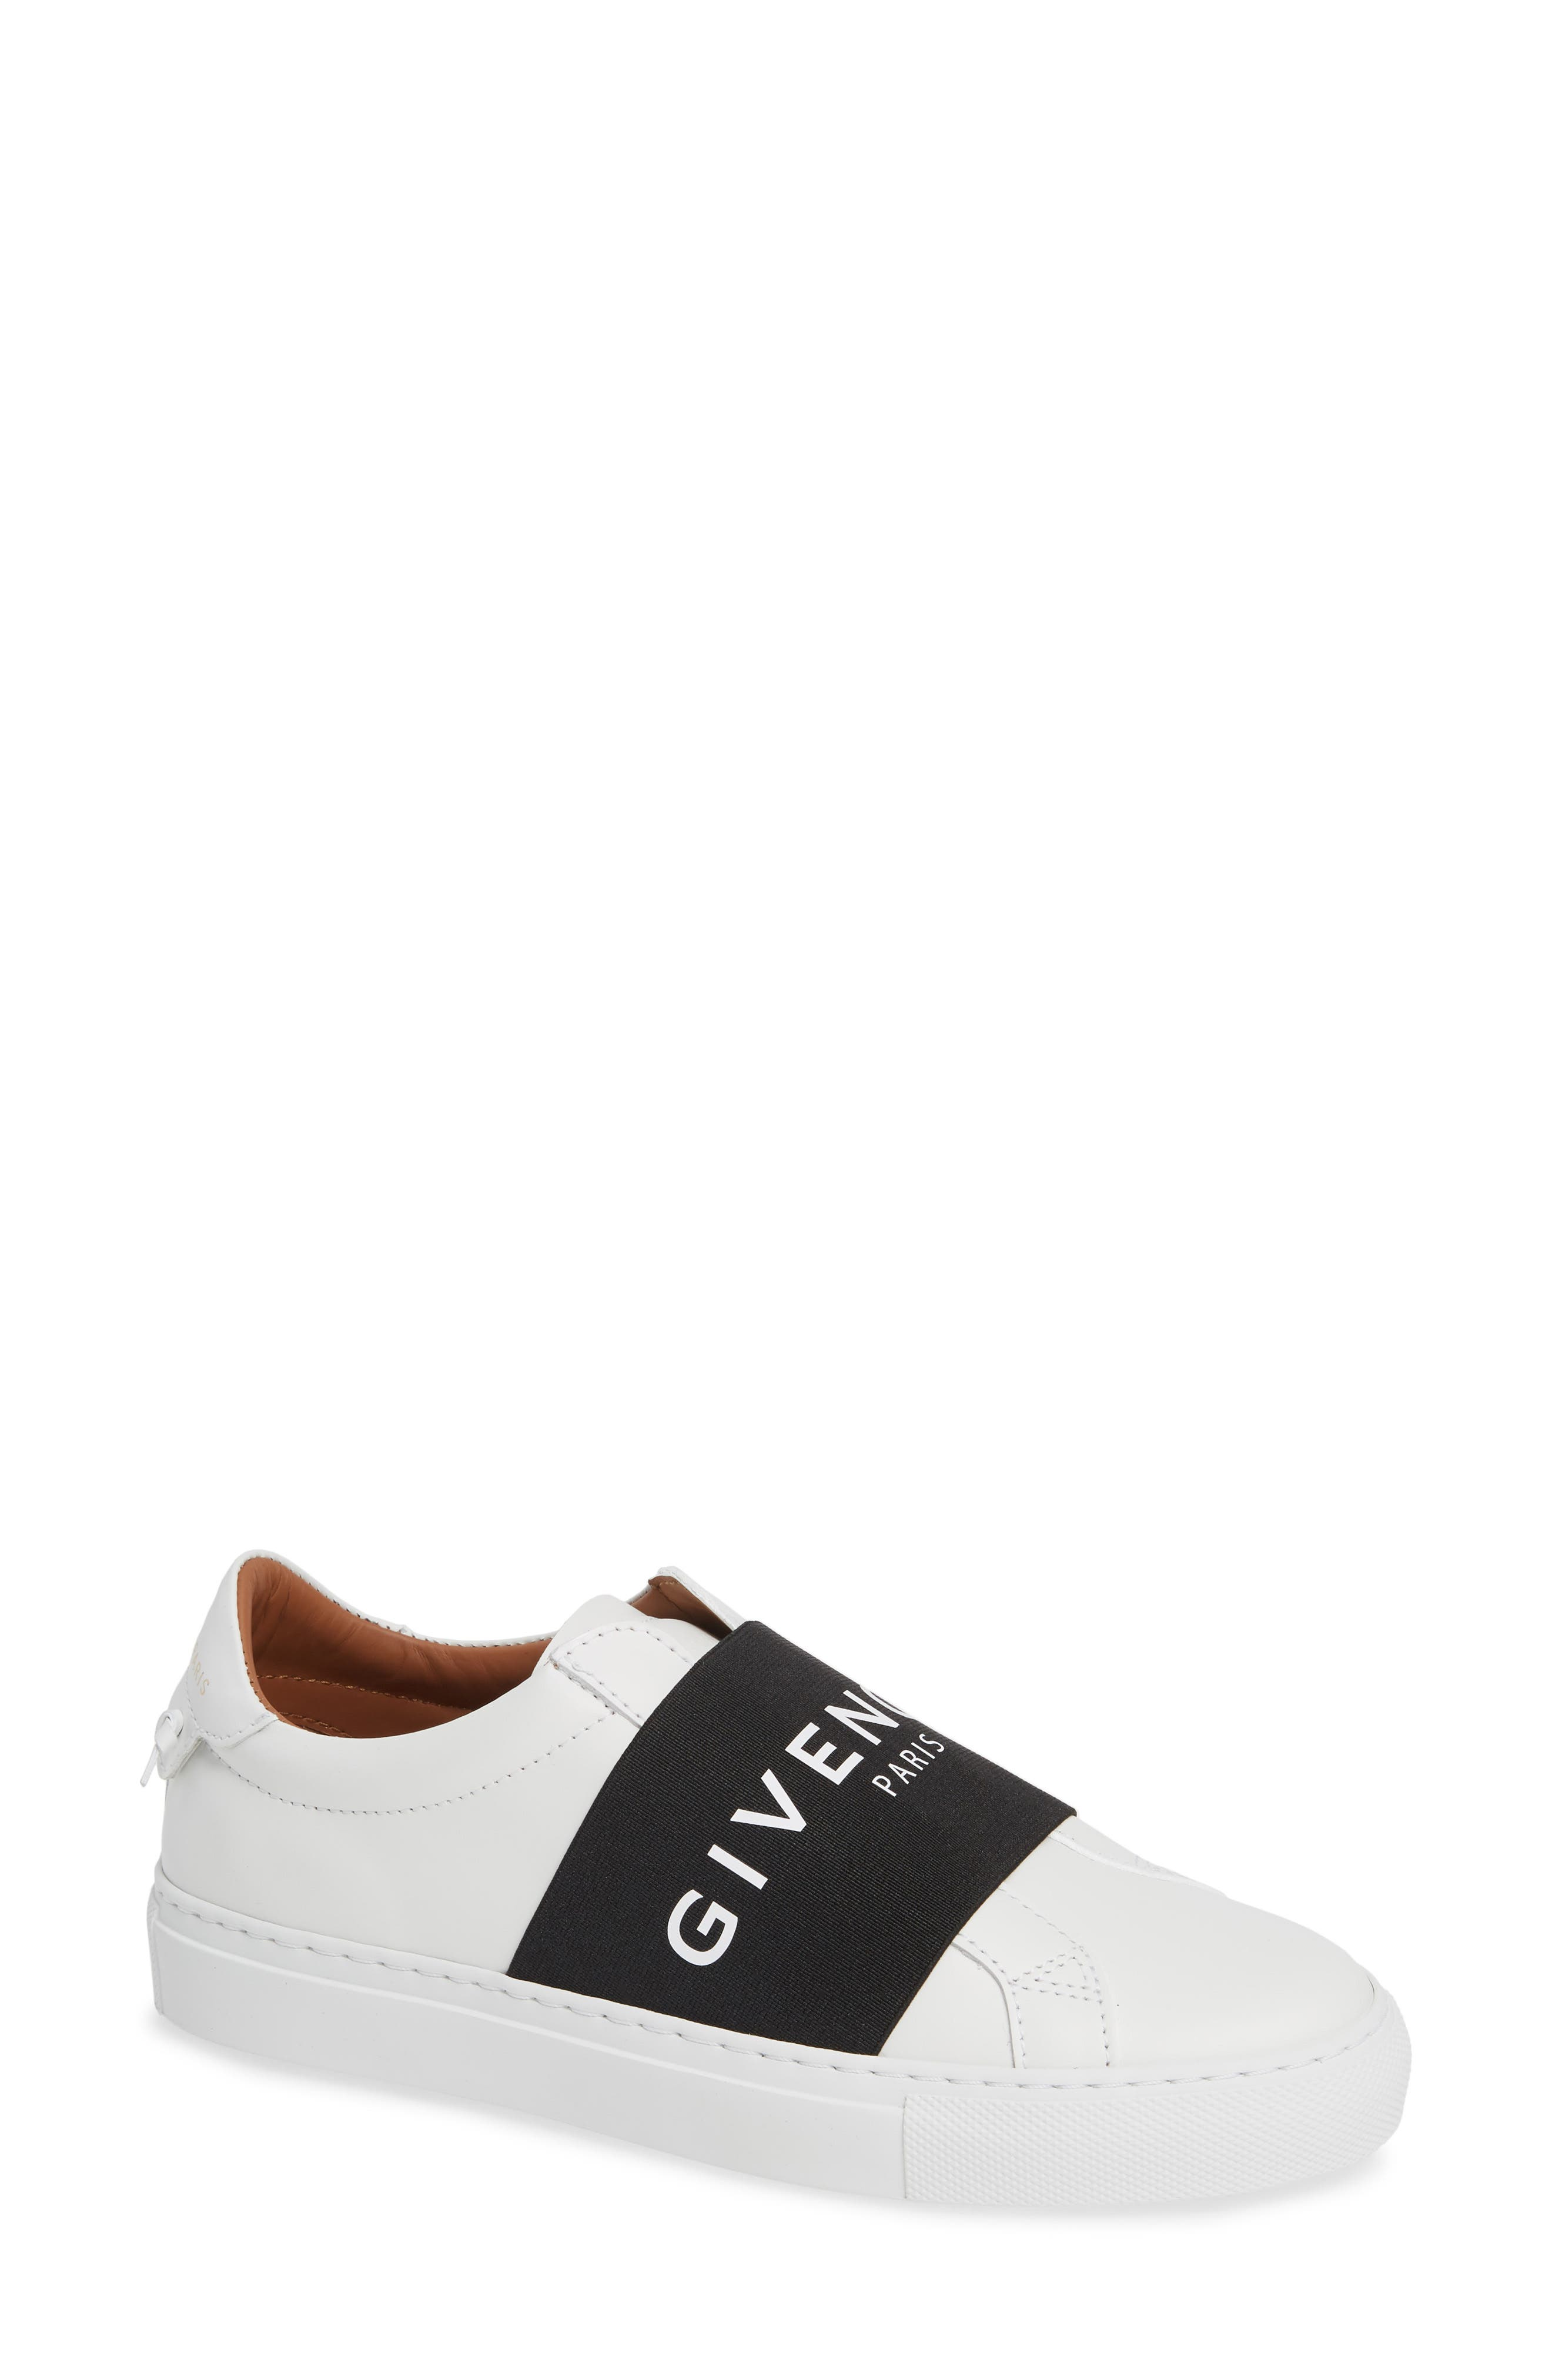 GIVENCHY, Logo Strap Slip-On Sneaker, Main thumbnail 1, color, WHITE